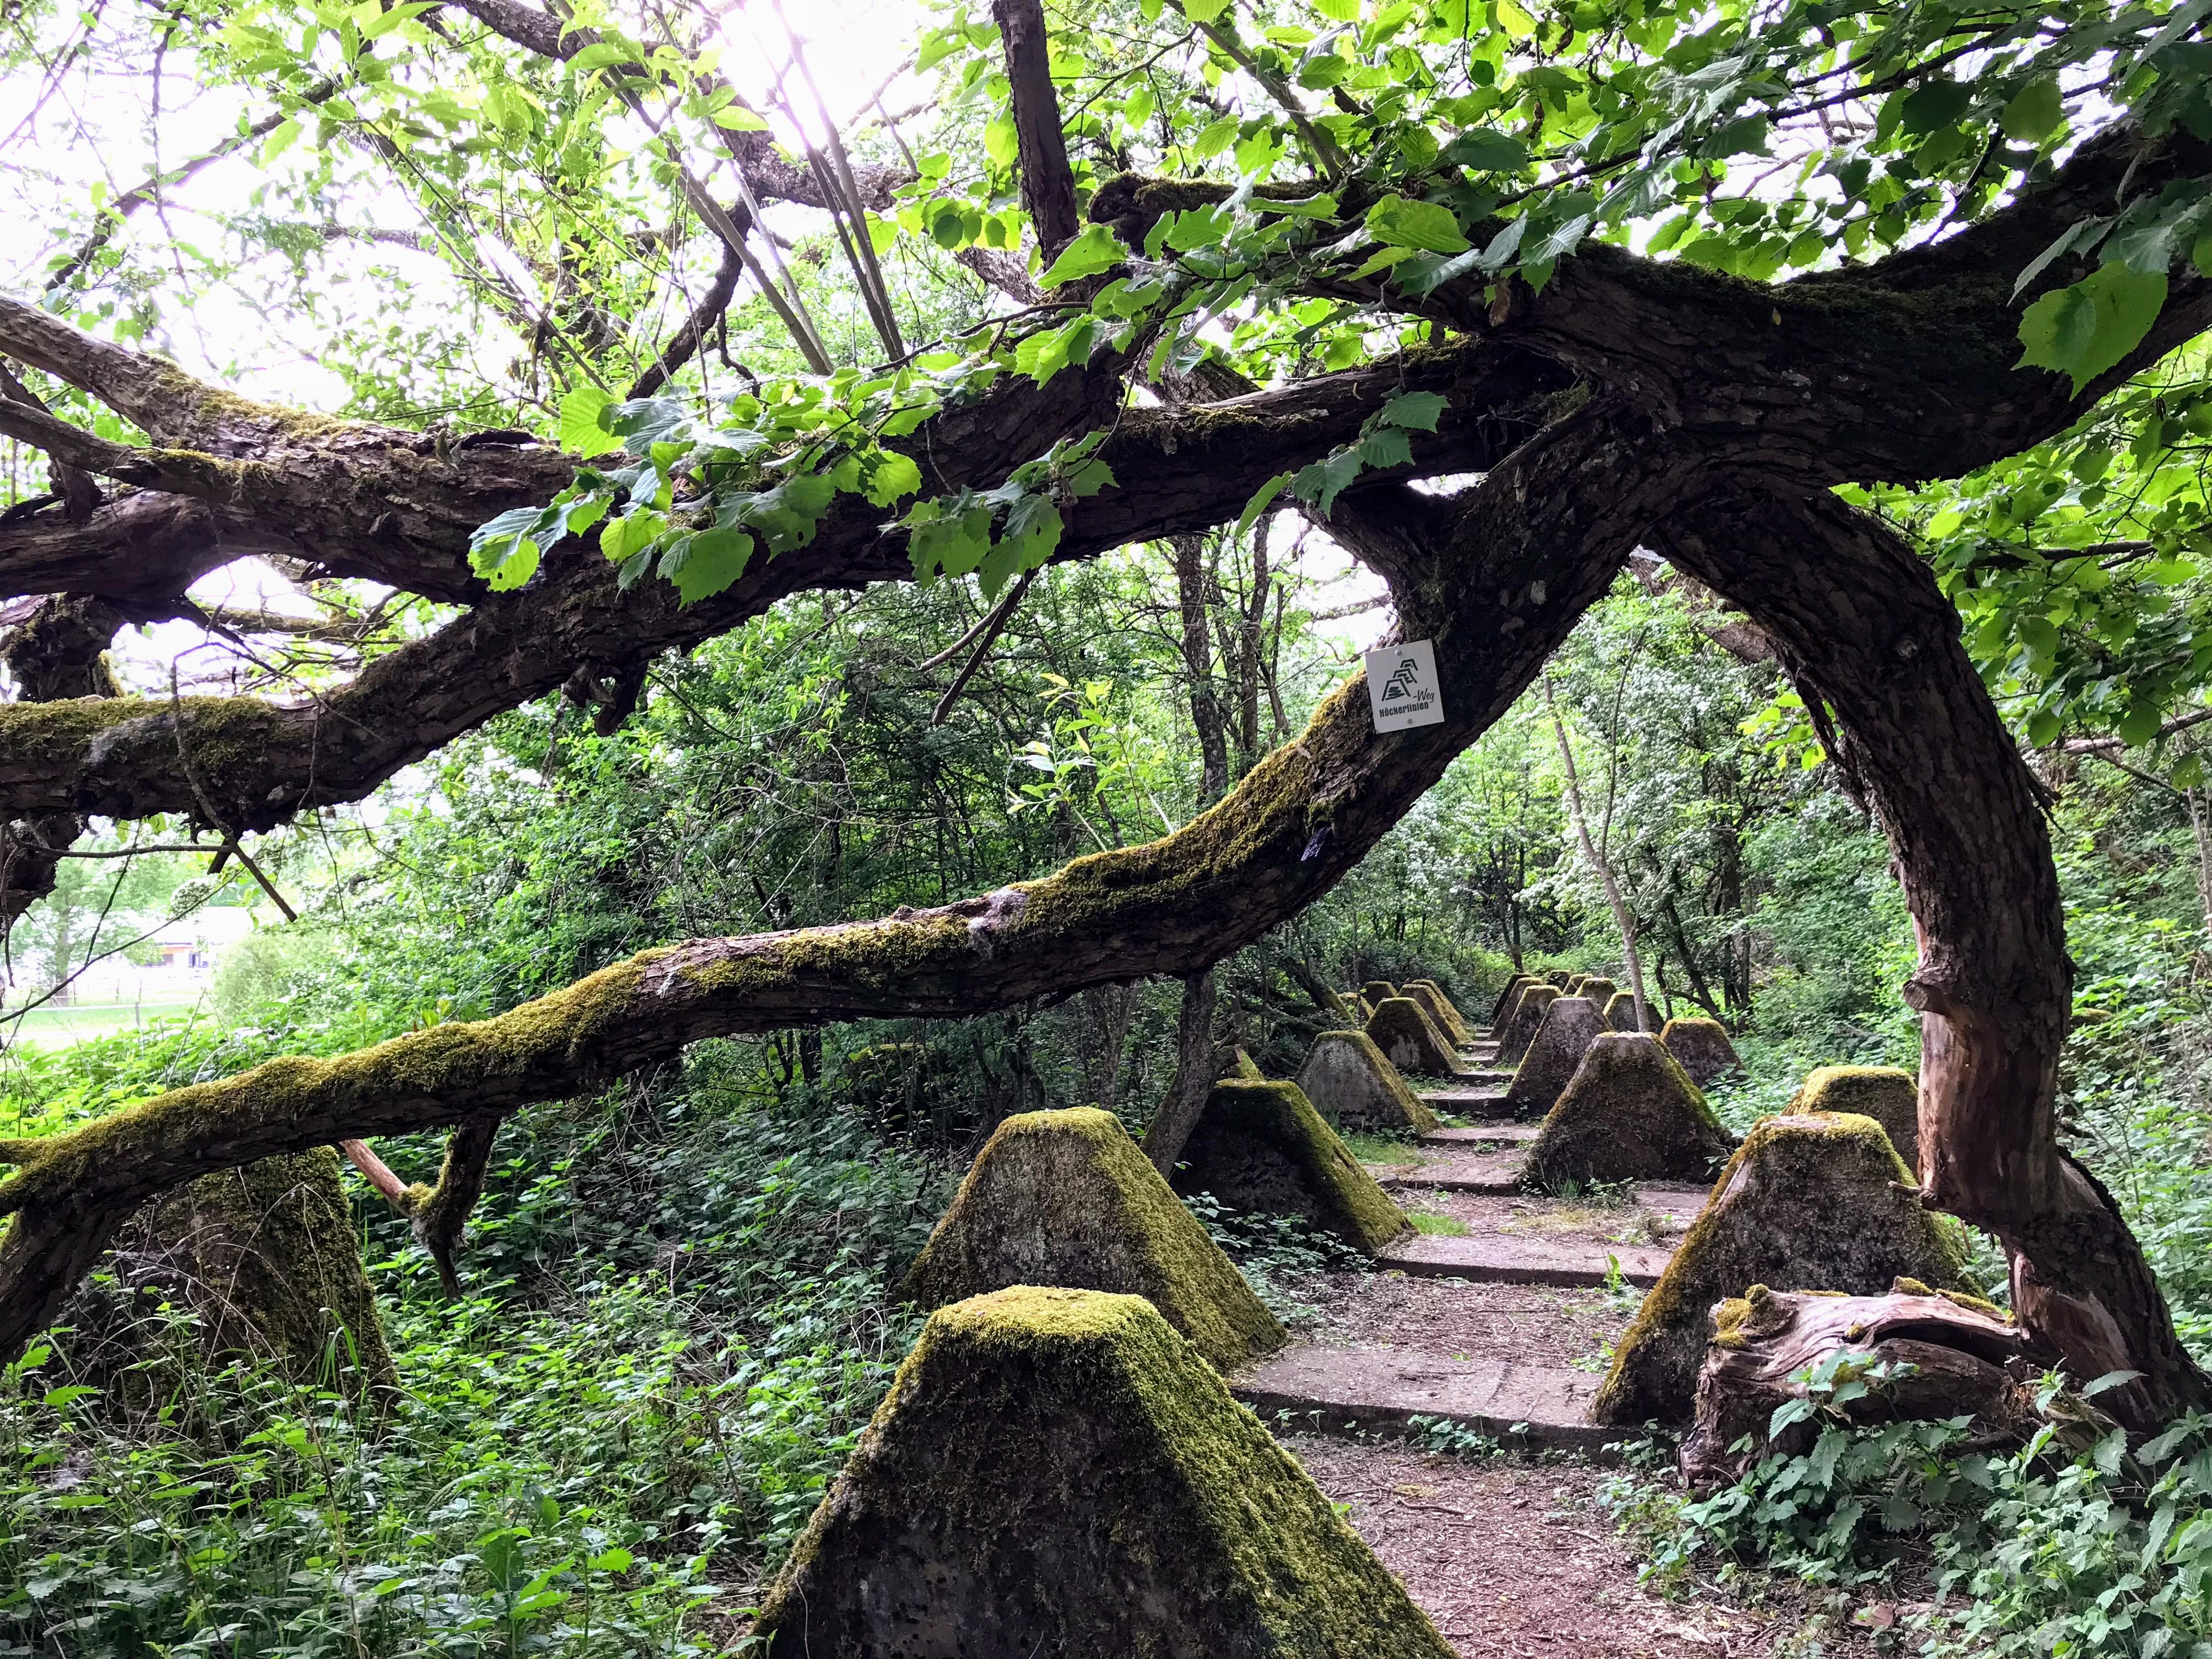 Höckerlinienweg - wandelen tussen de 'drakentanden'